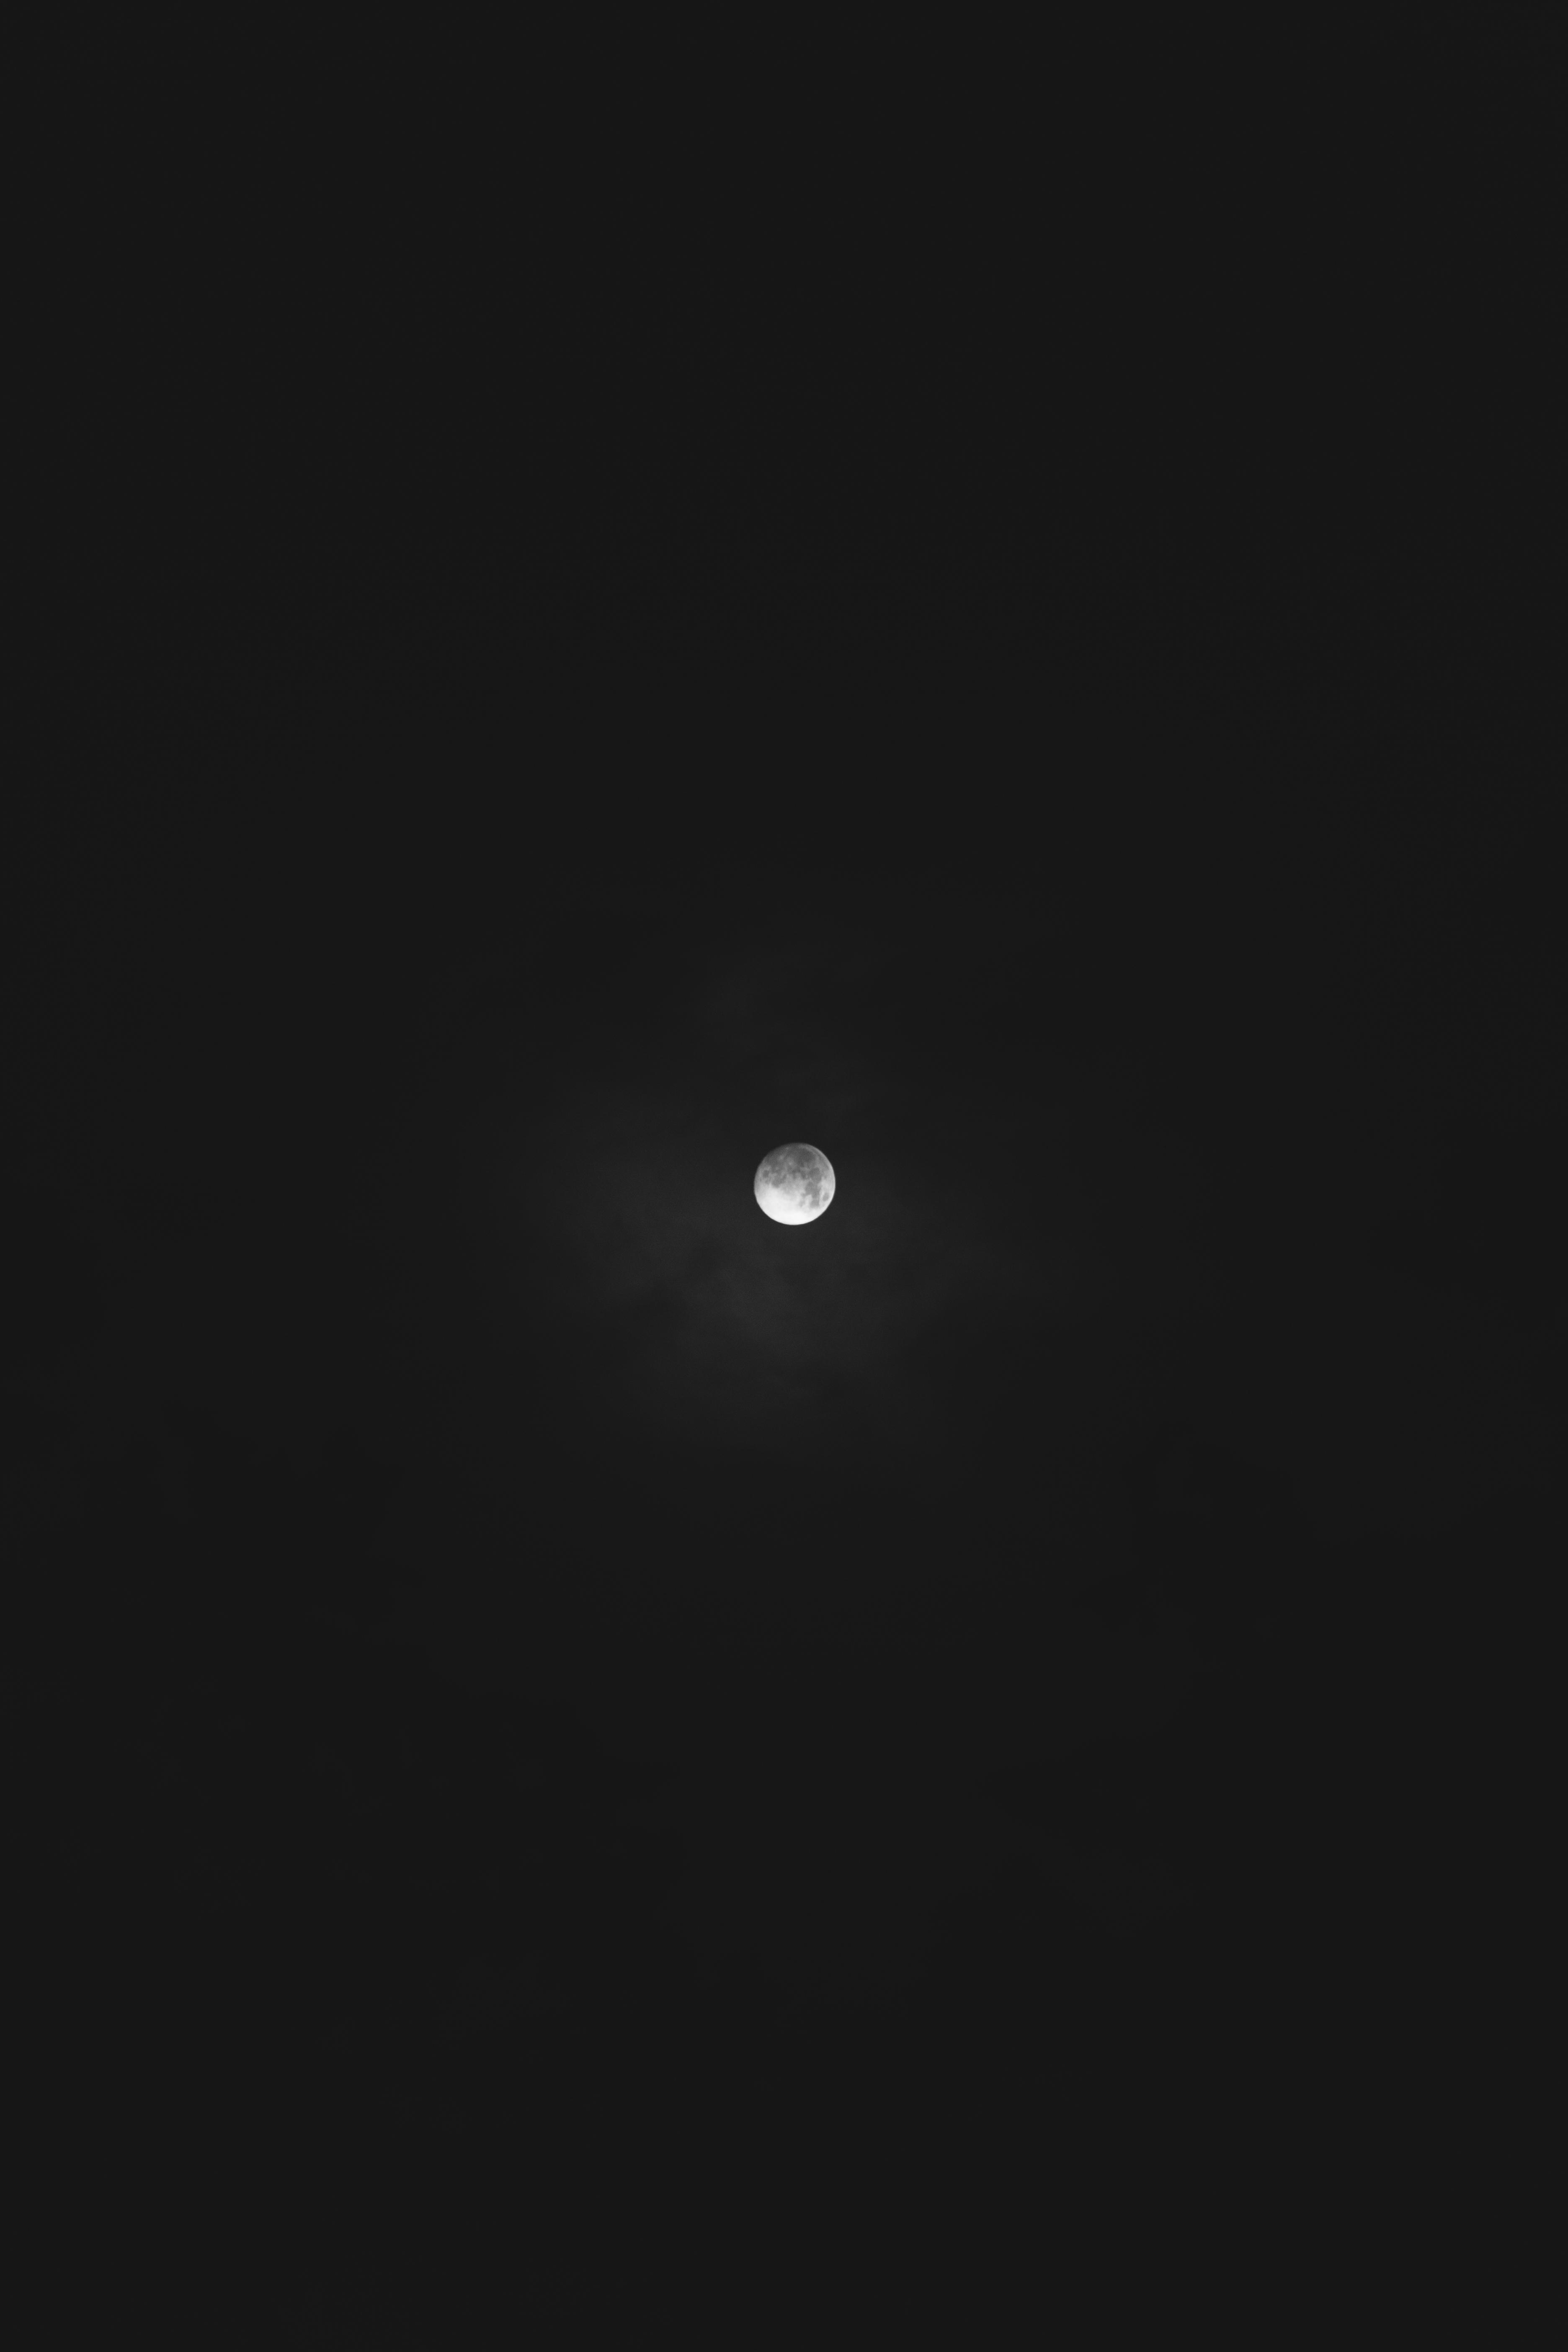 Moon on black background photo